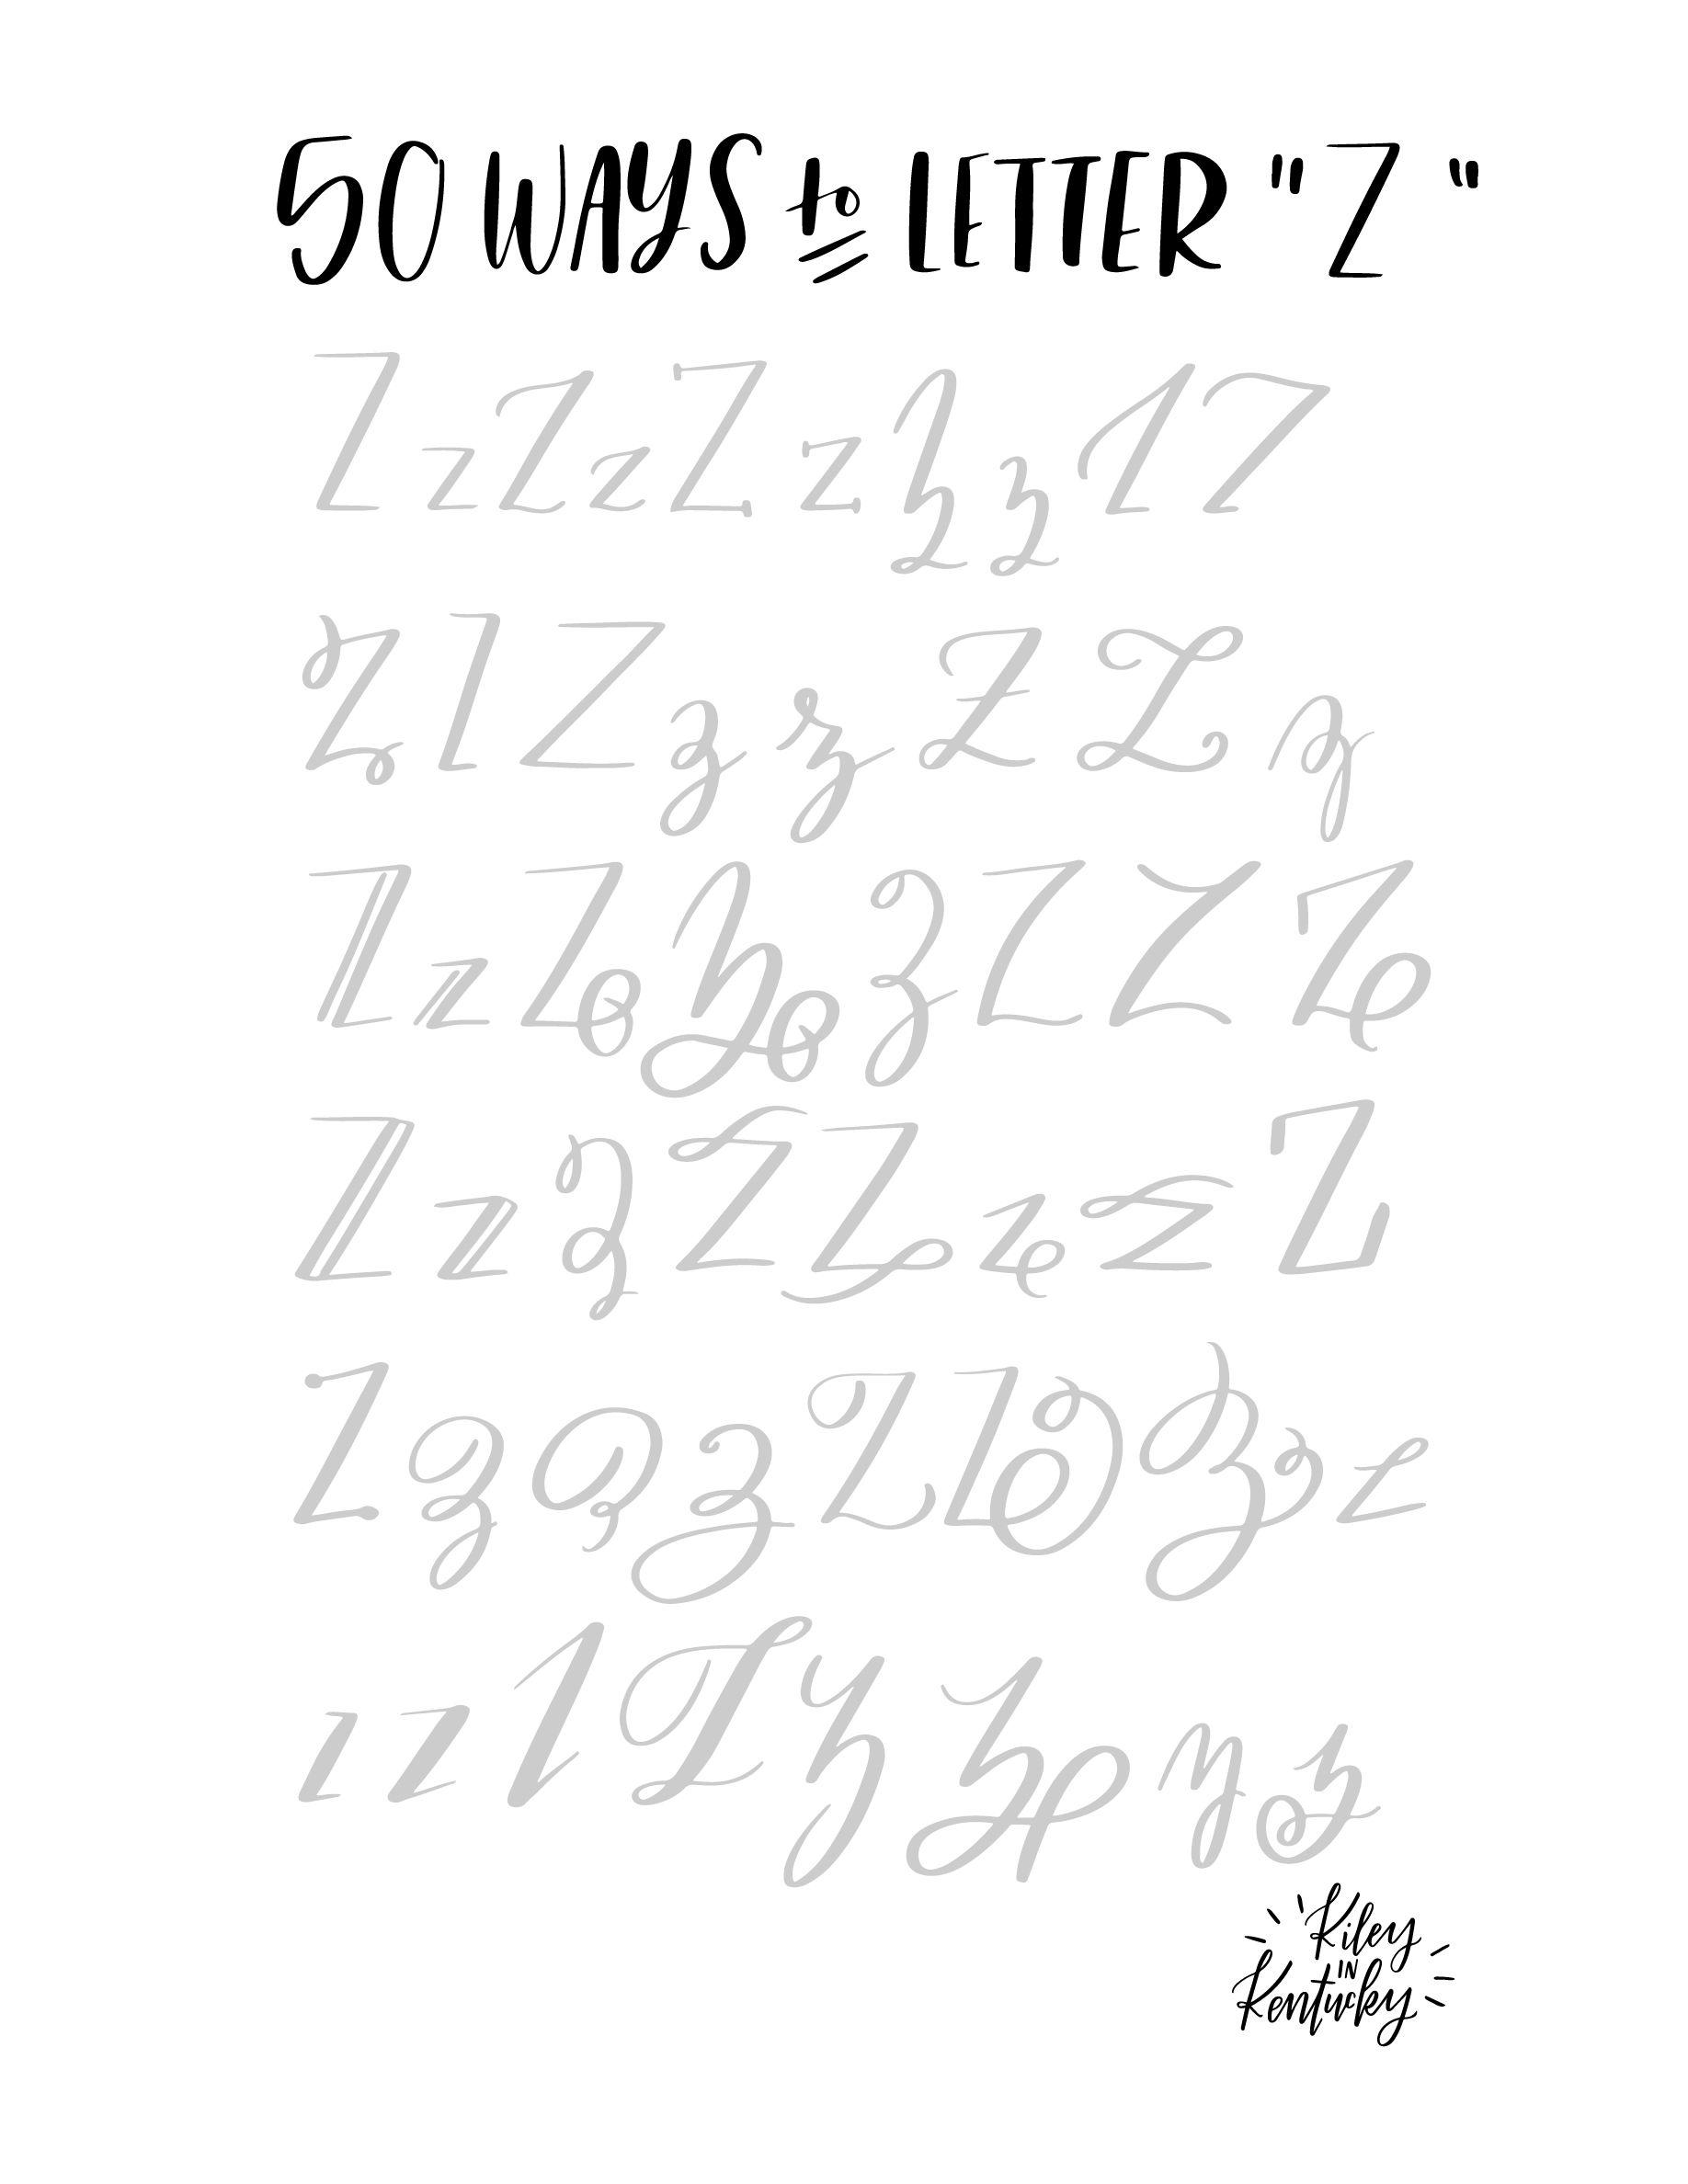 Letter Z   letters   Pinterest   Letters, Fonts and Bullet journals